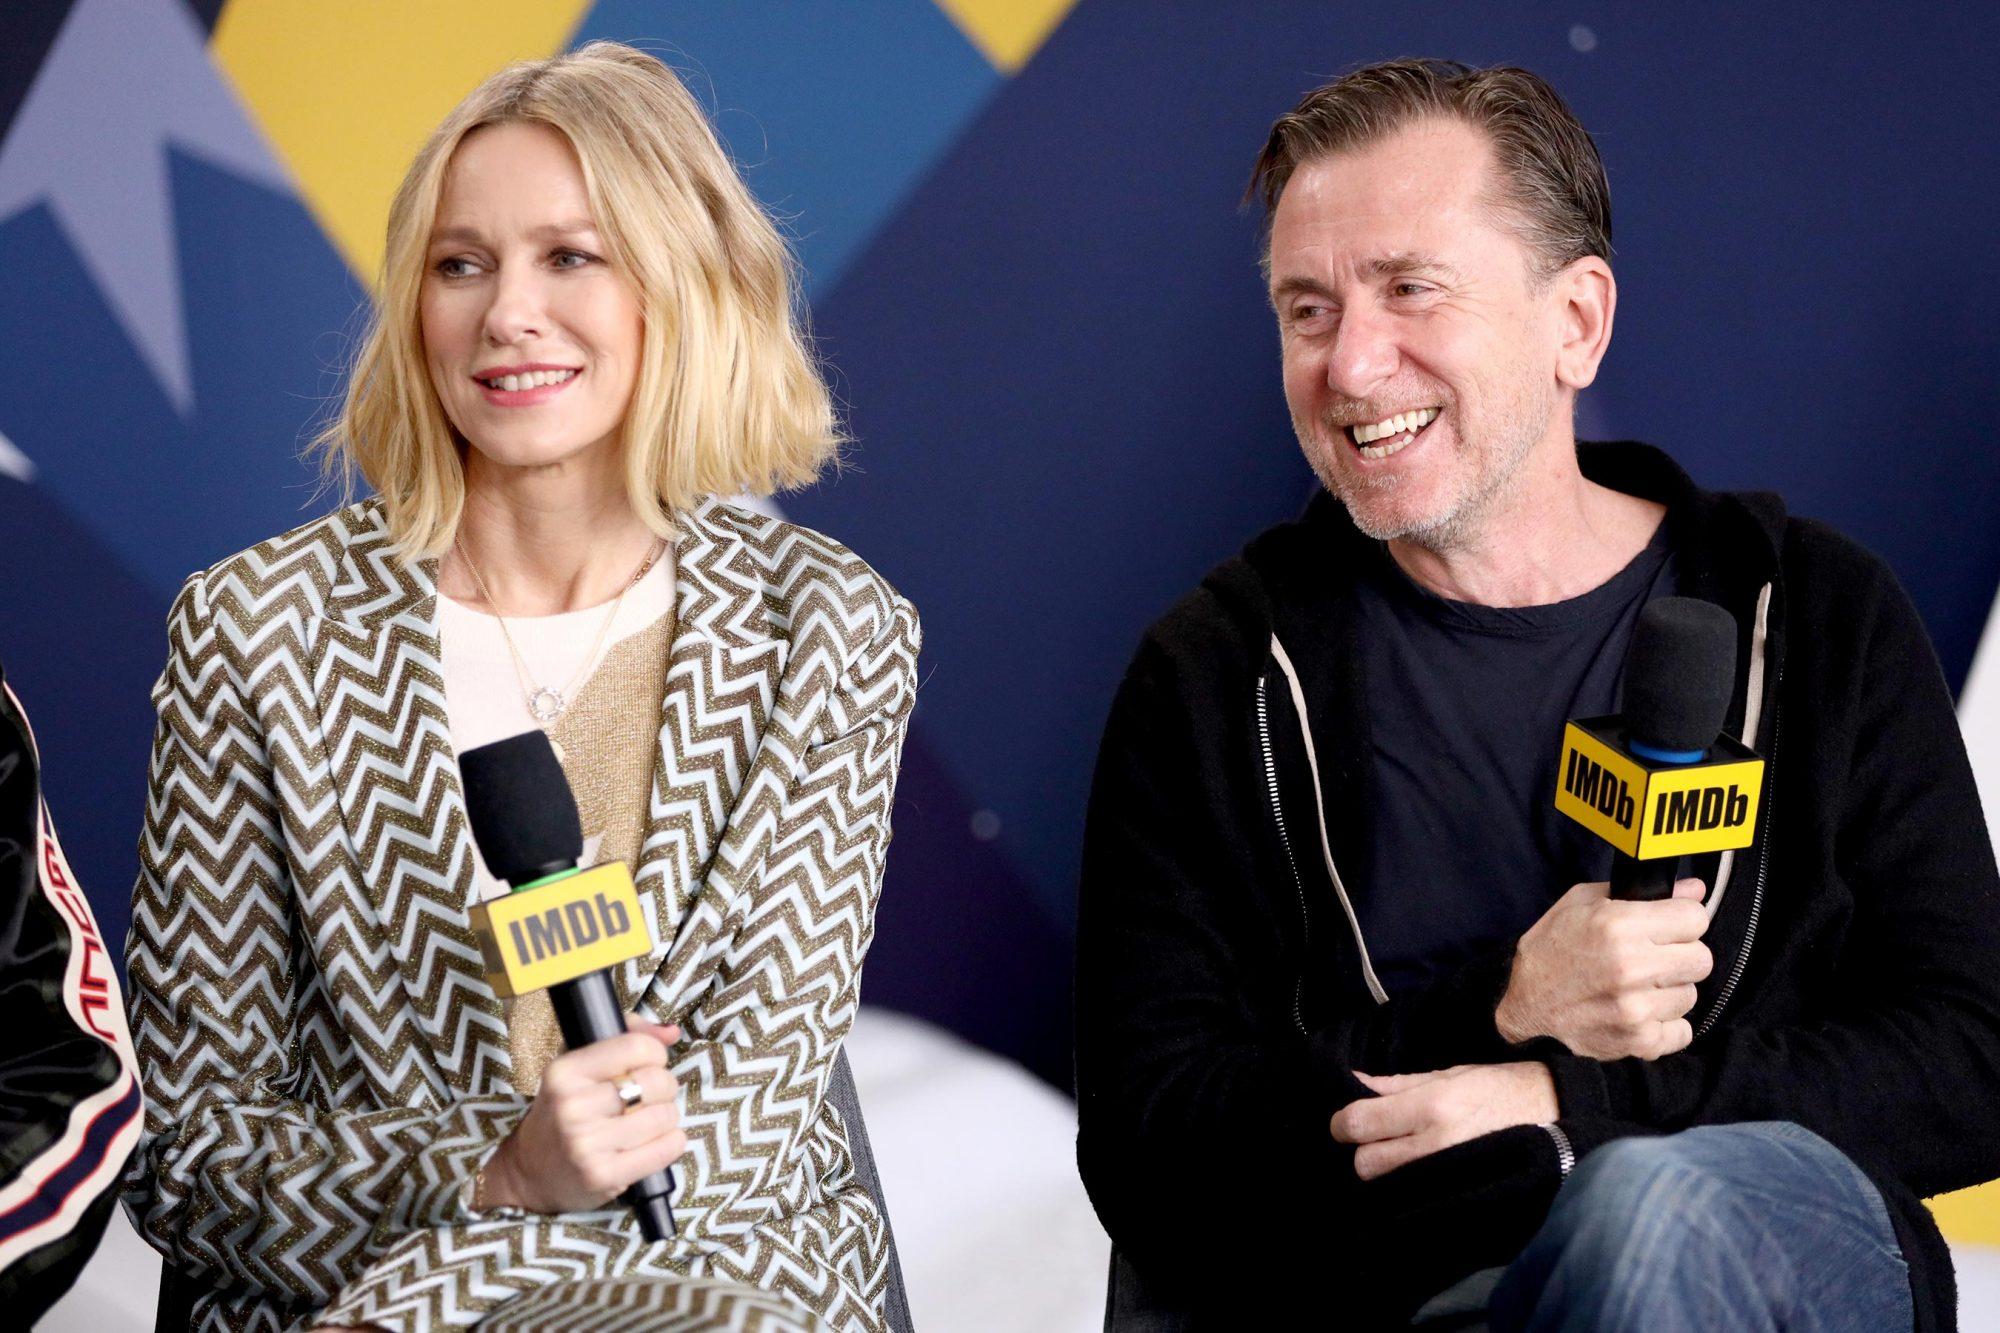 The IMDb Studio At Acura Festival Village On Location At The 2019 Sundance Film Festival - Day 3